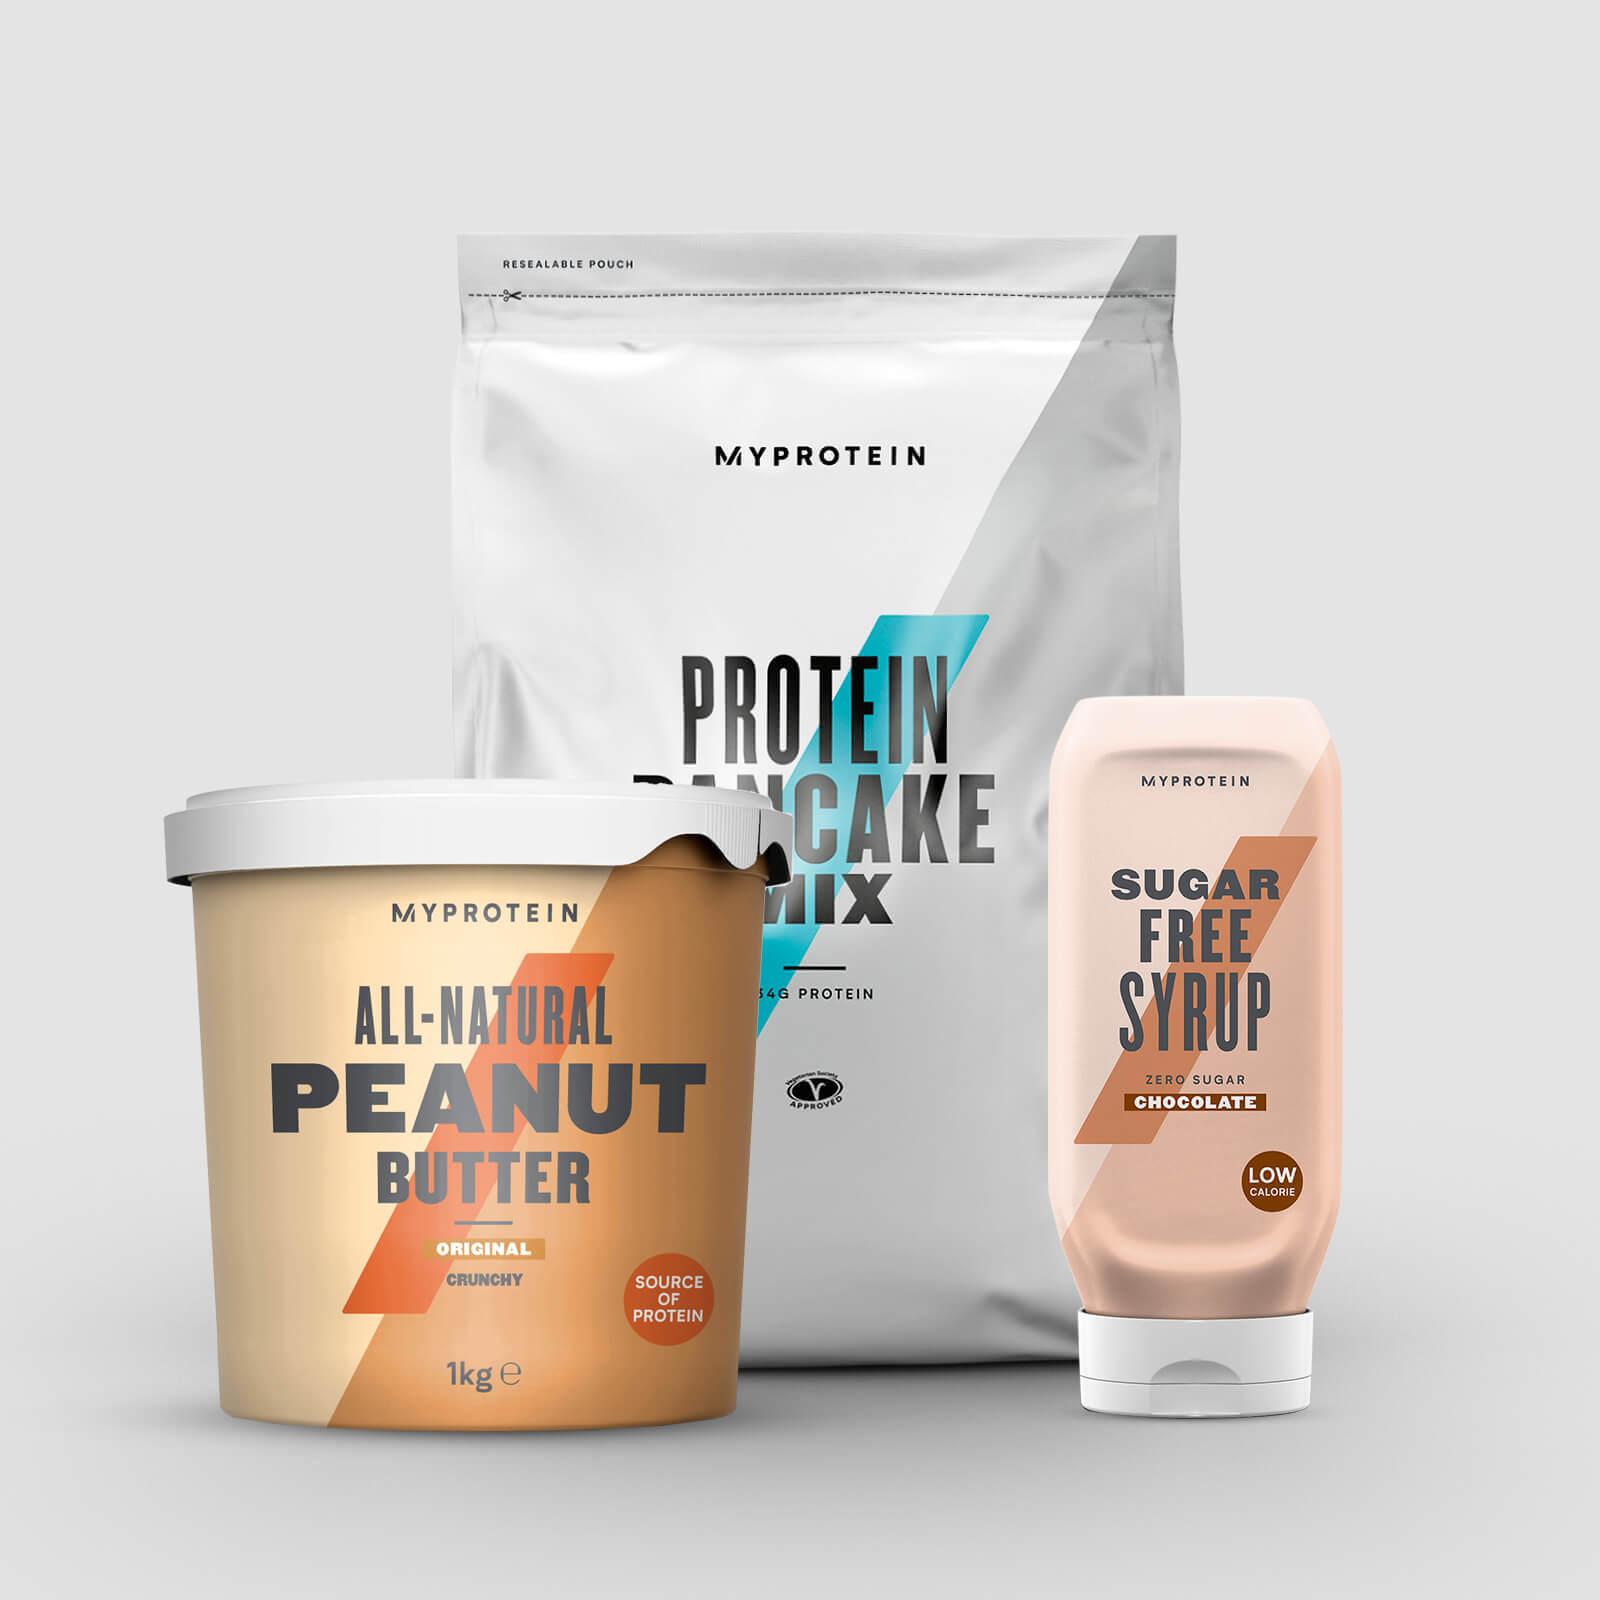 Pack pour Pancake Protéiné - Pancake Mix - Golden Syrup - Syrup - Chocolate